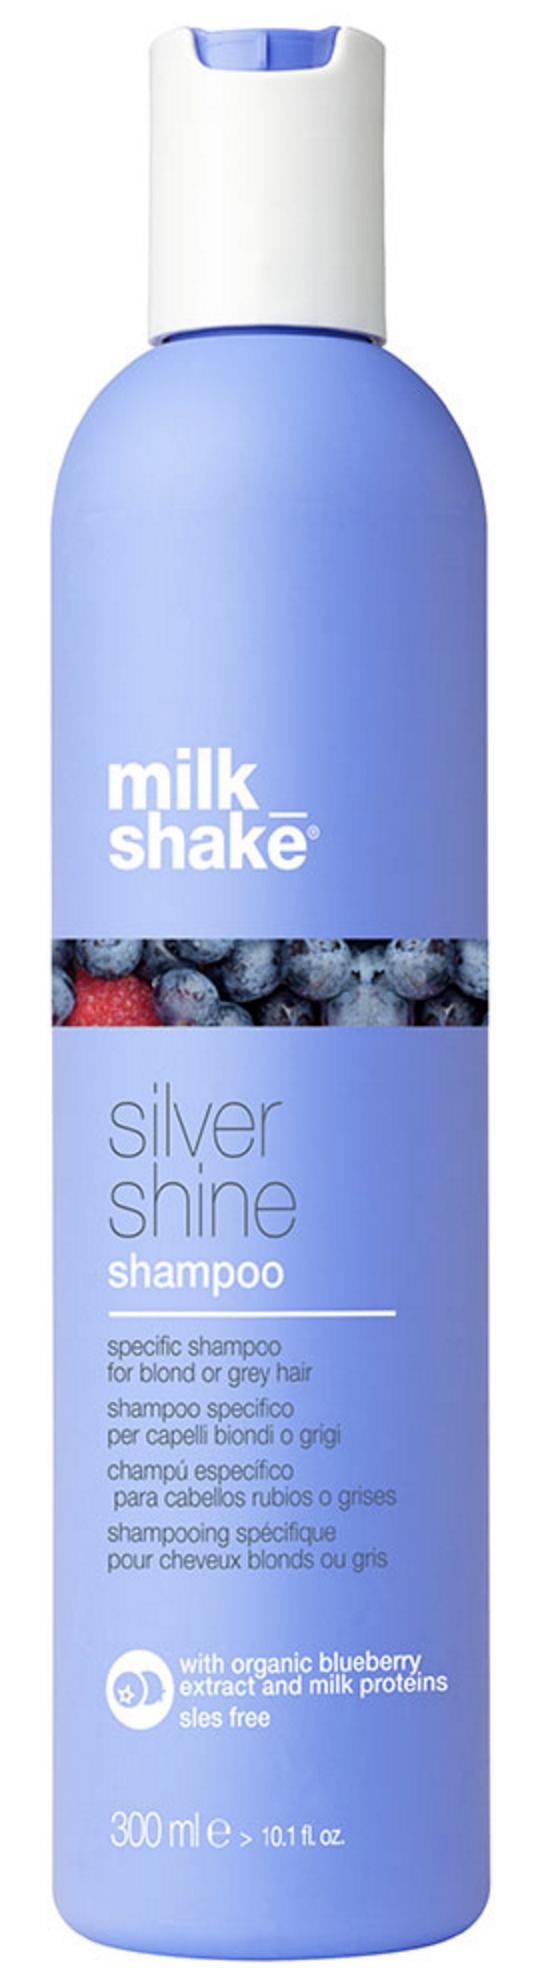 køb milkshake hårprodukter